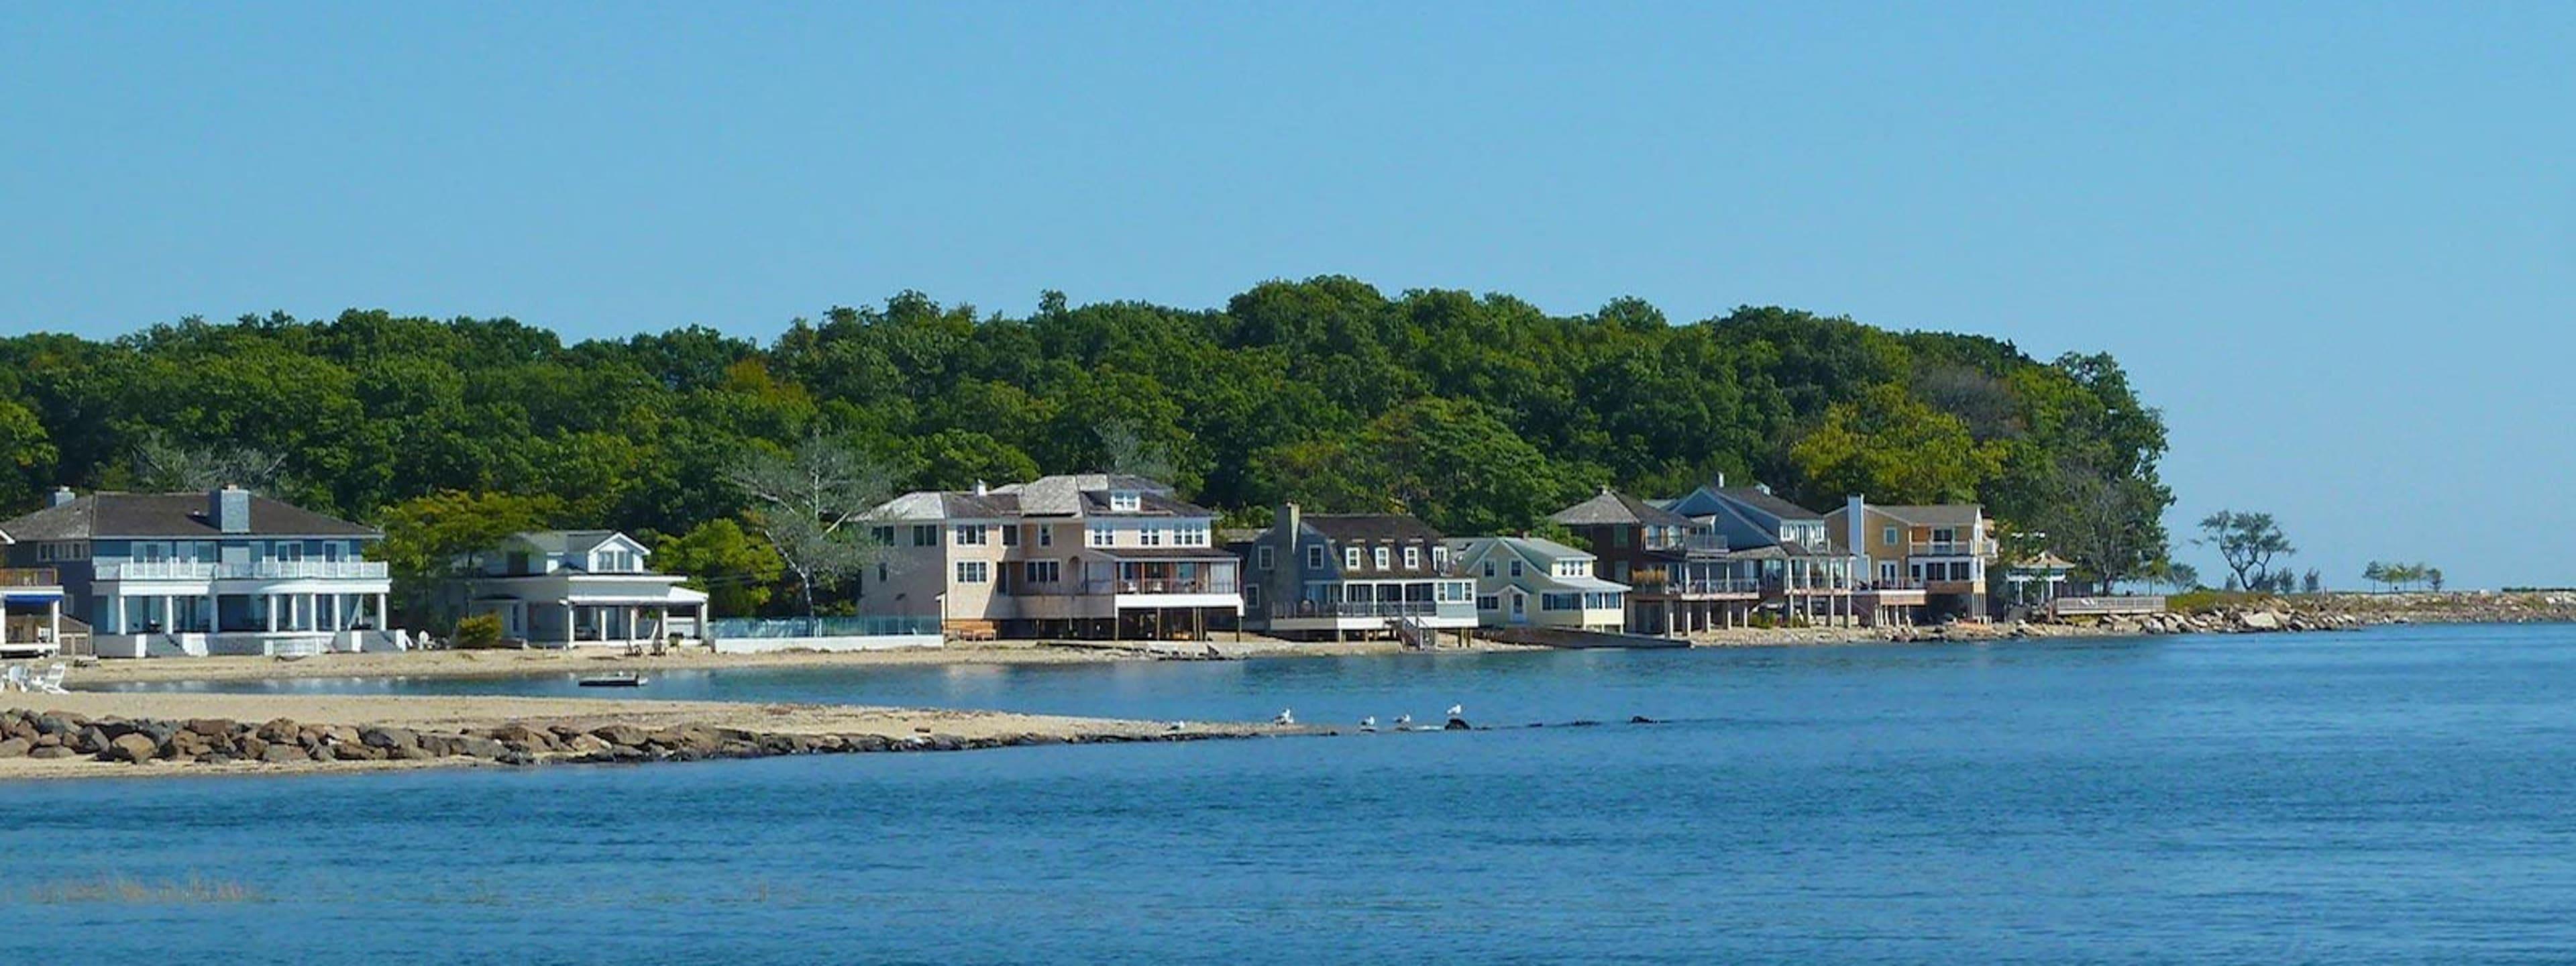 Westport Ct Real Estate Homes For Sale Michael Teng At Keller